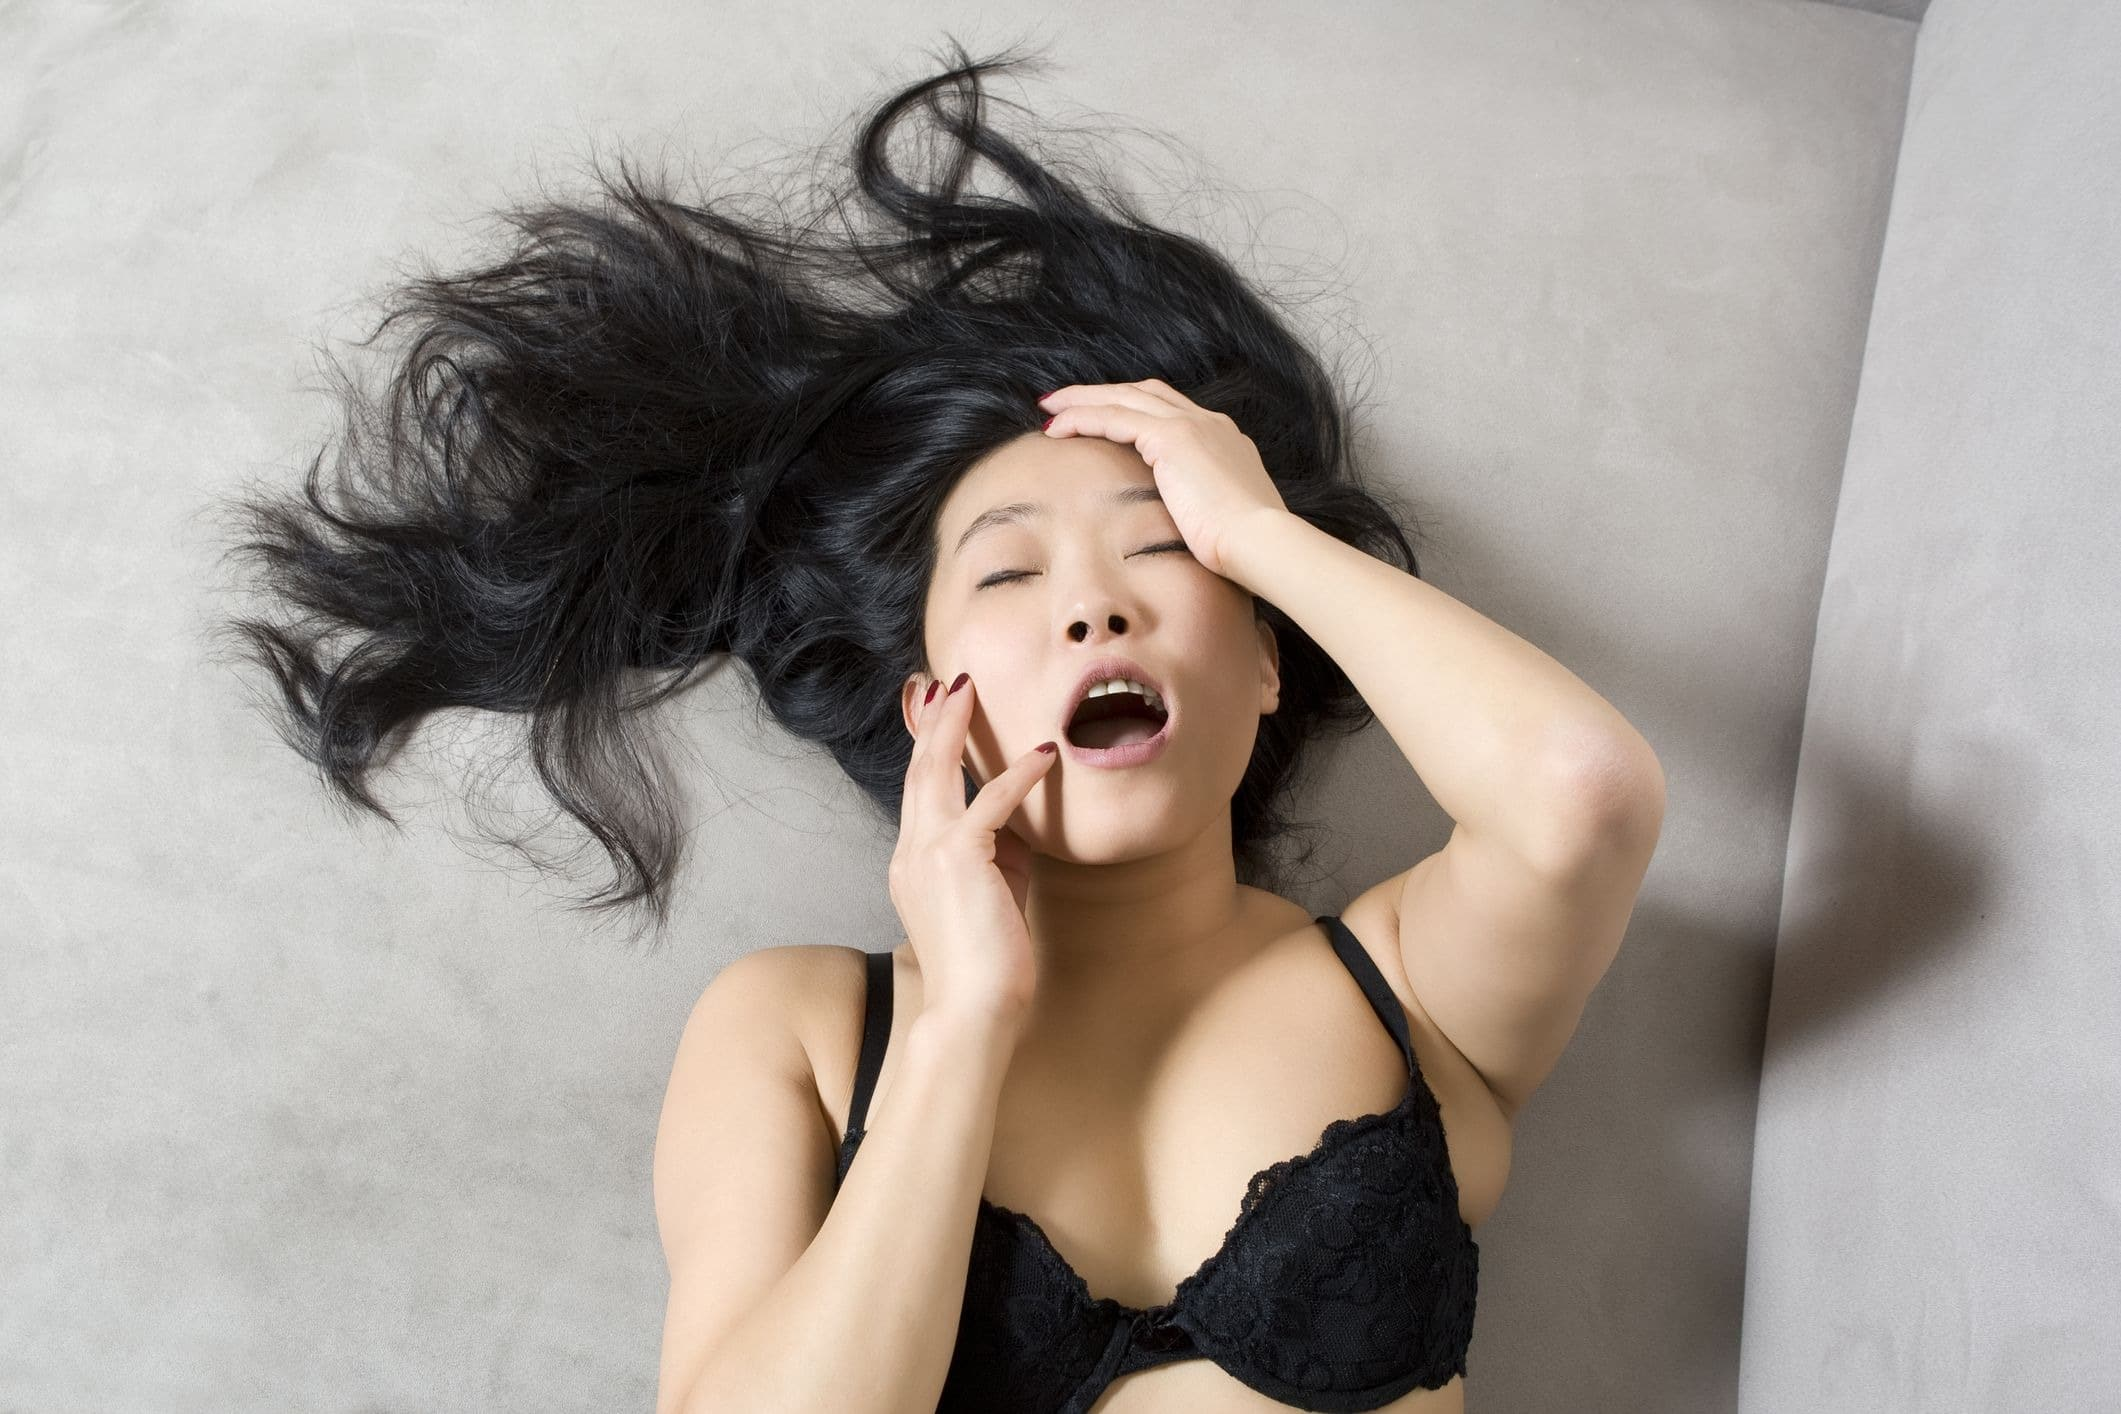 Bigpicture ru woman having an orgasm royalty f